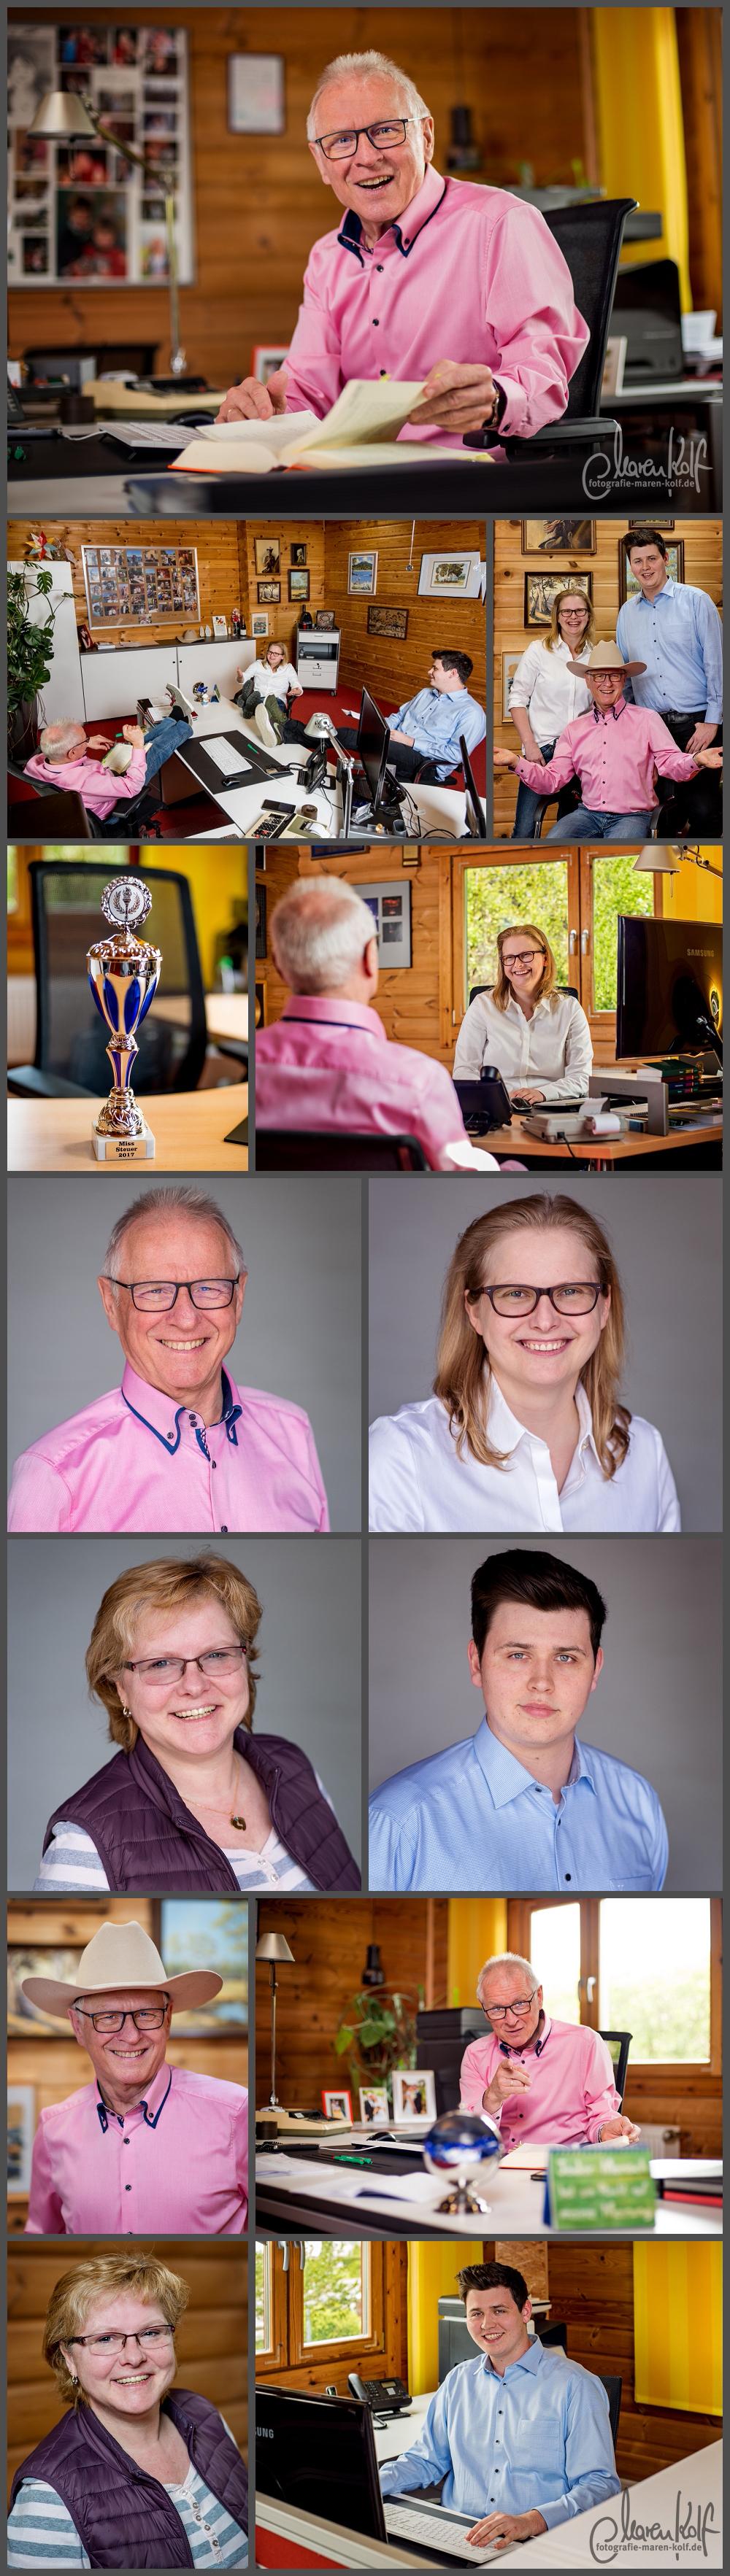 businessportraits-steuerkanzlei-winkler-wedemark-maren-kolf-fotografie-blog